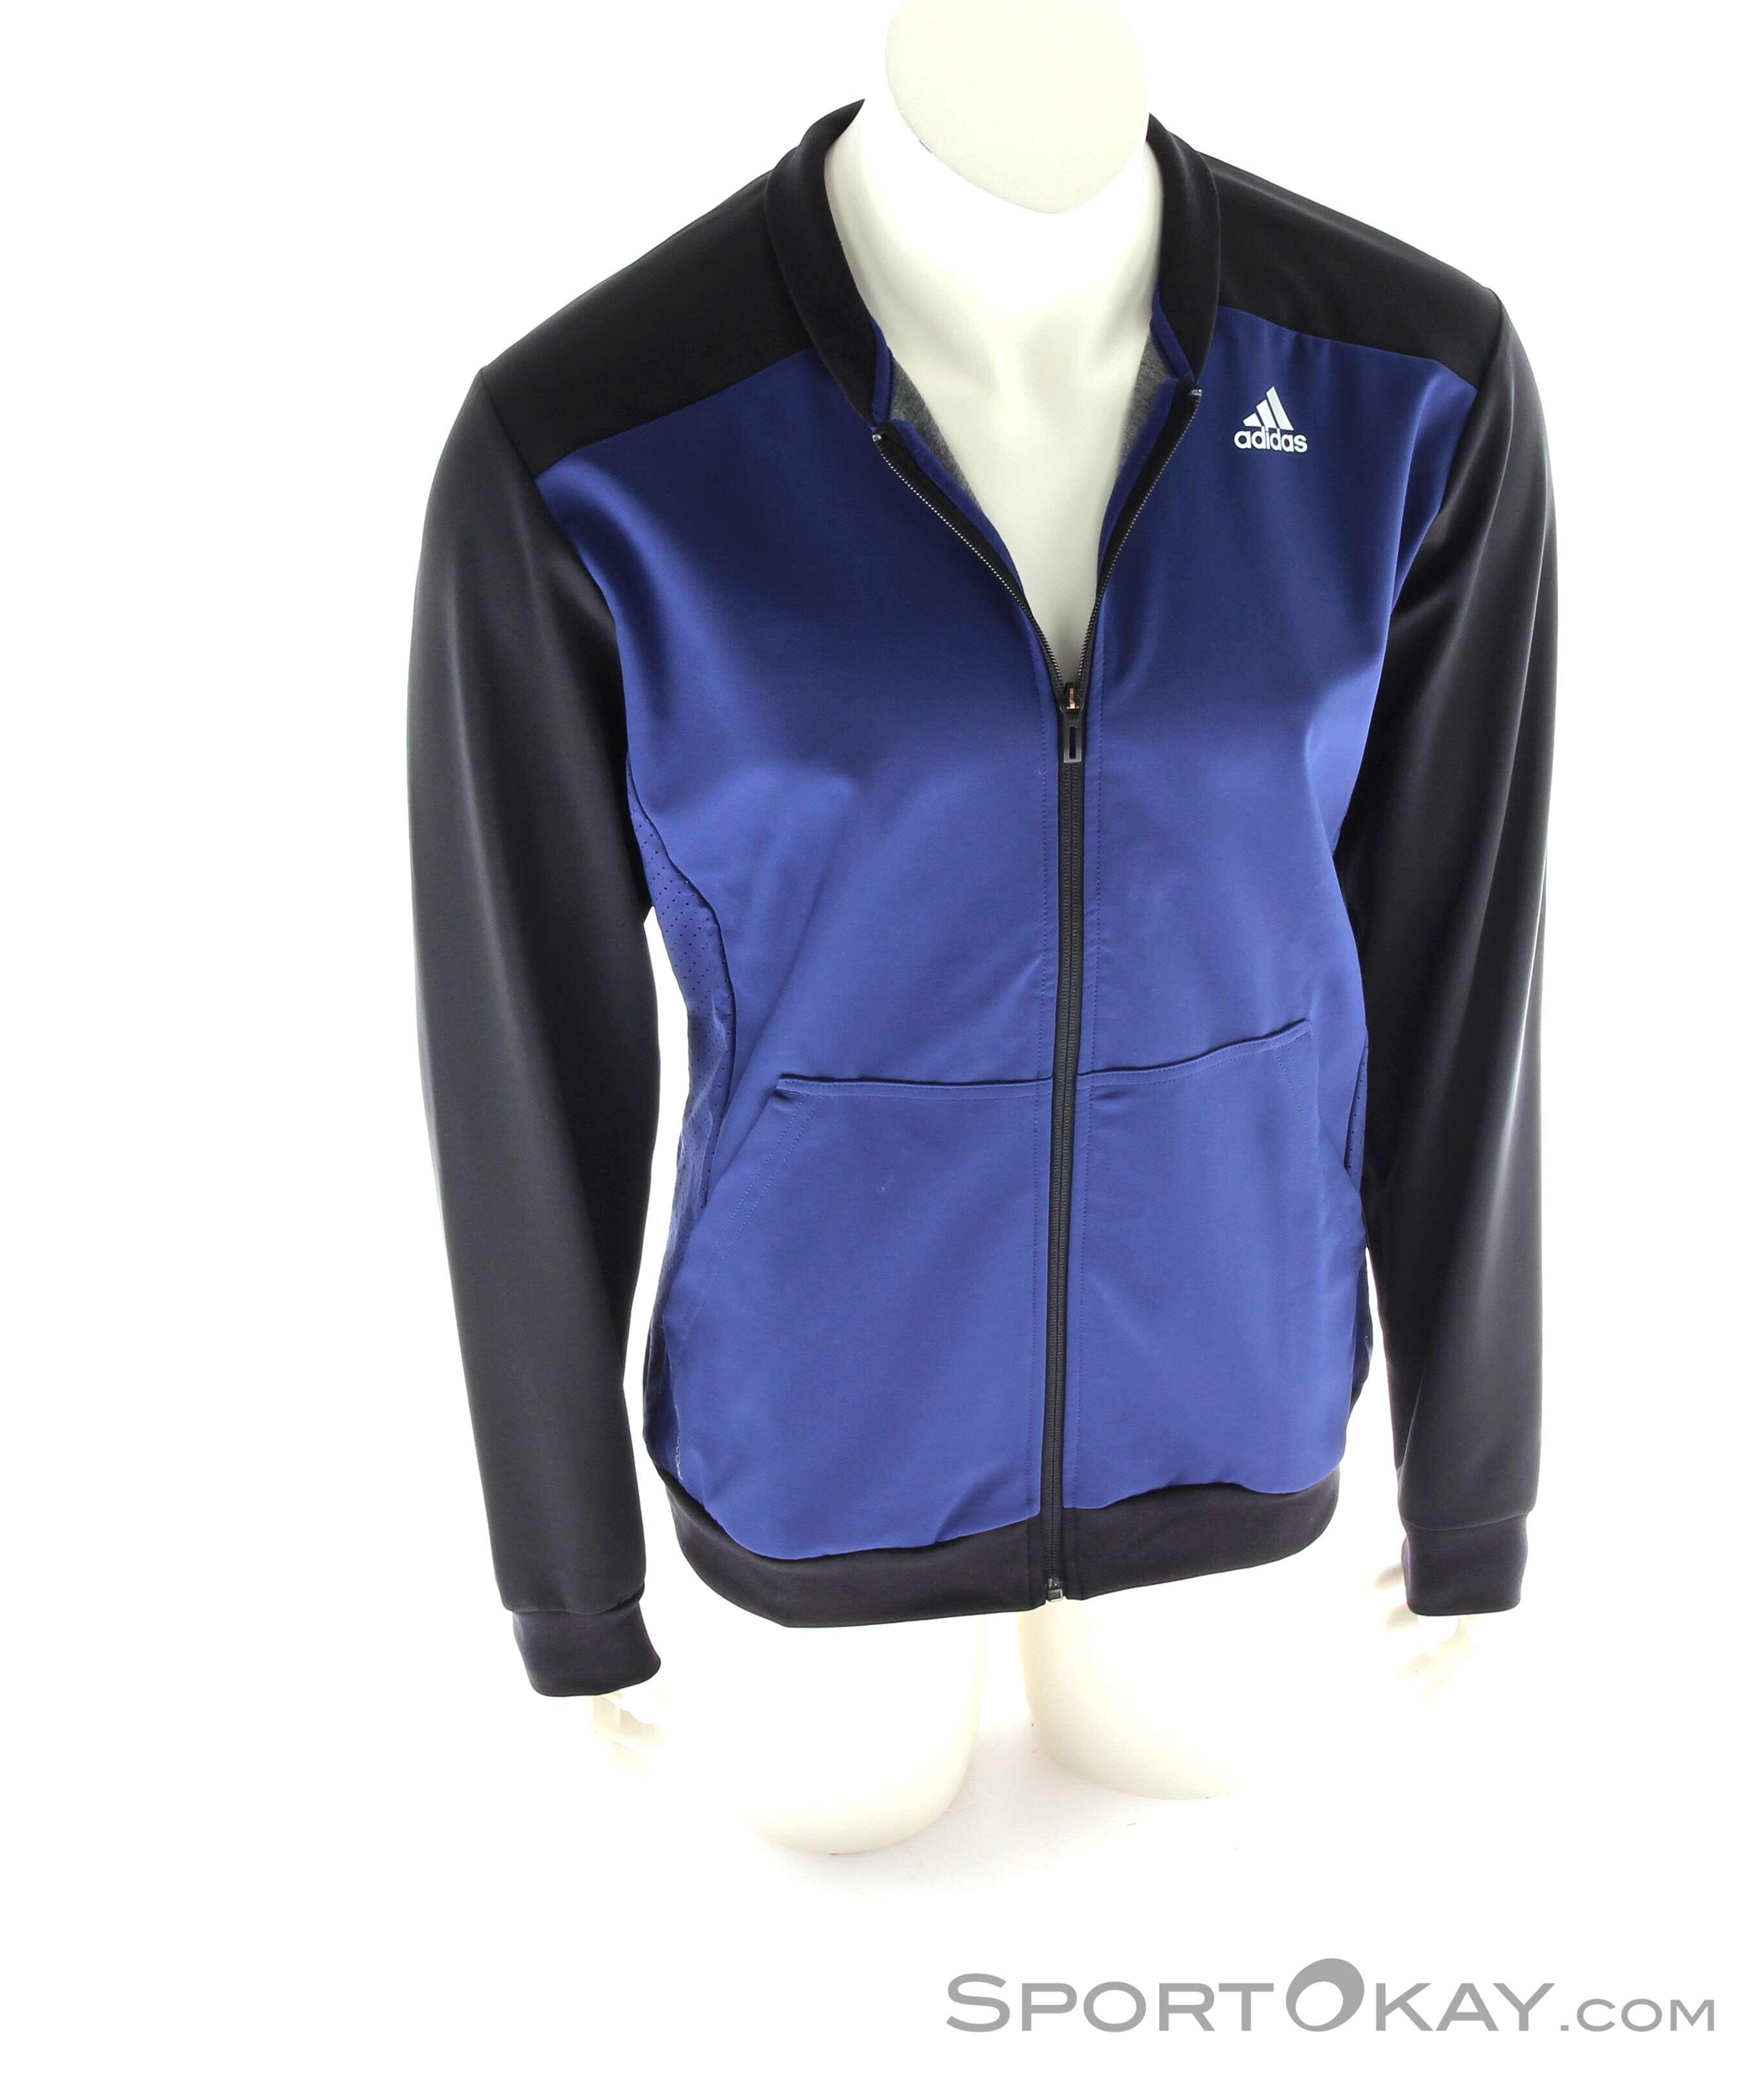 Adidas trainer jacket